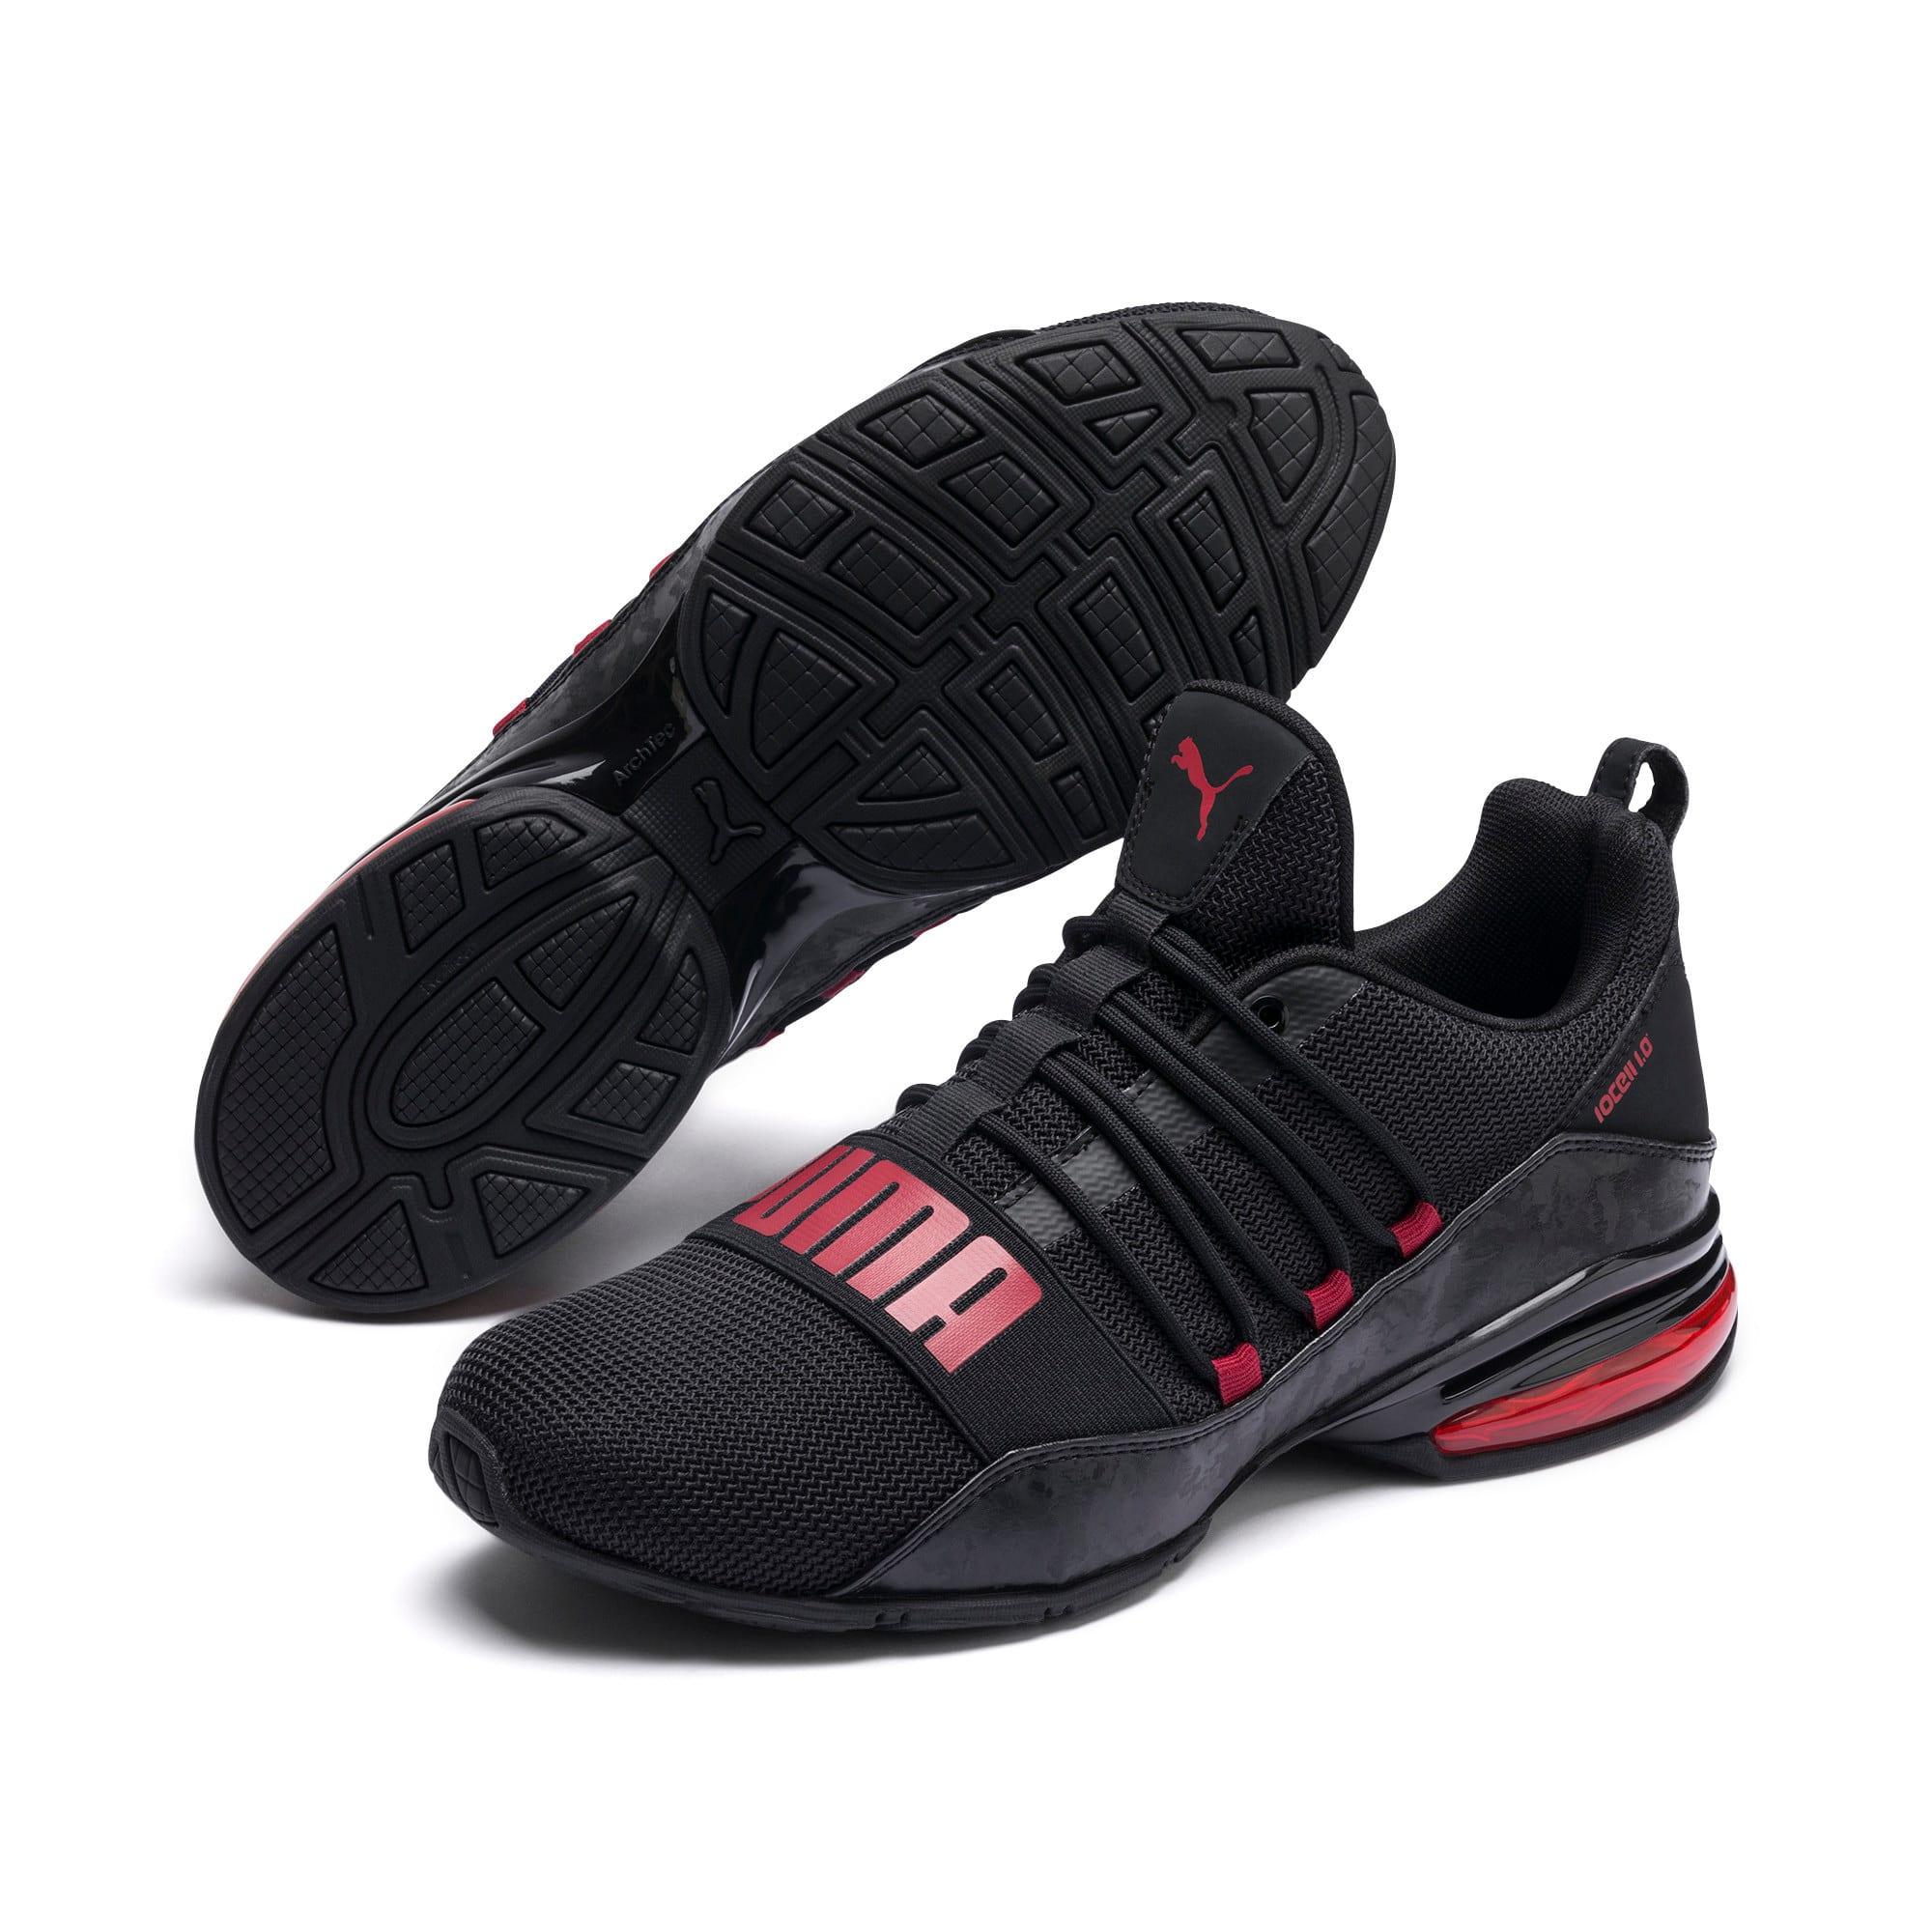 Miniatura 2 de Zapatos de entrenamiento CELL Regulate Camo para hombre, Puma Black-Rhubarb, mediano